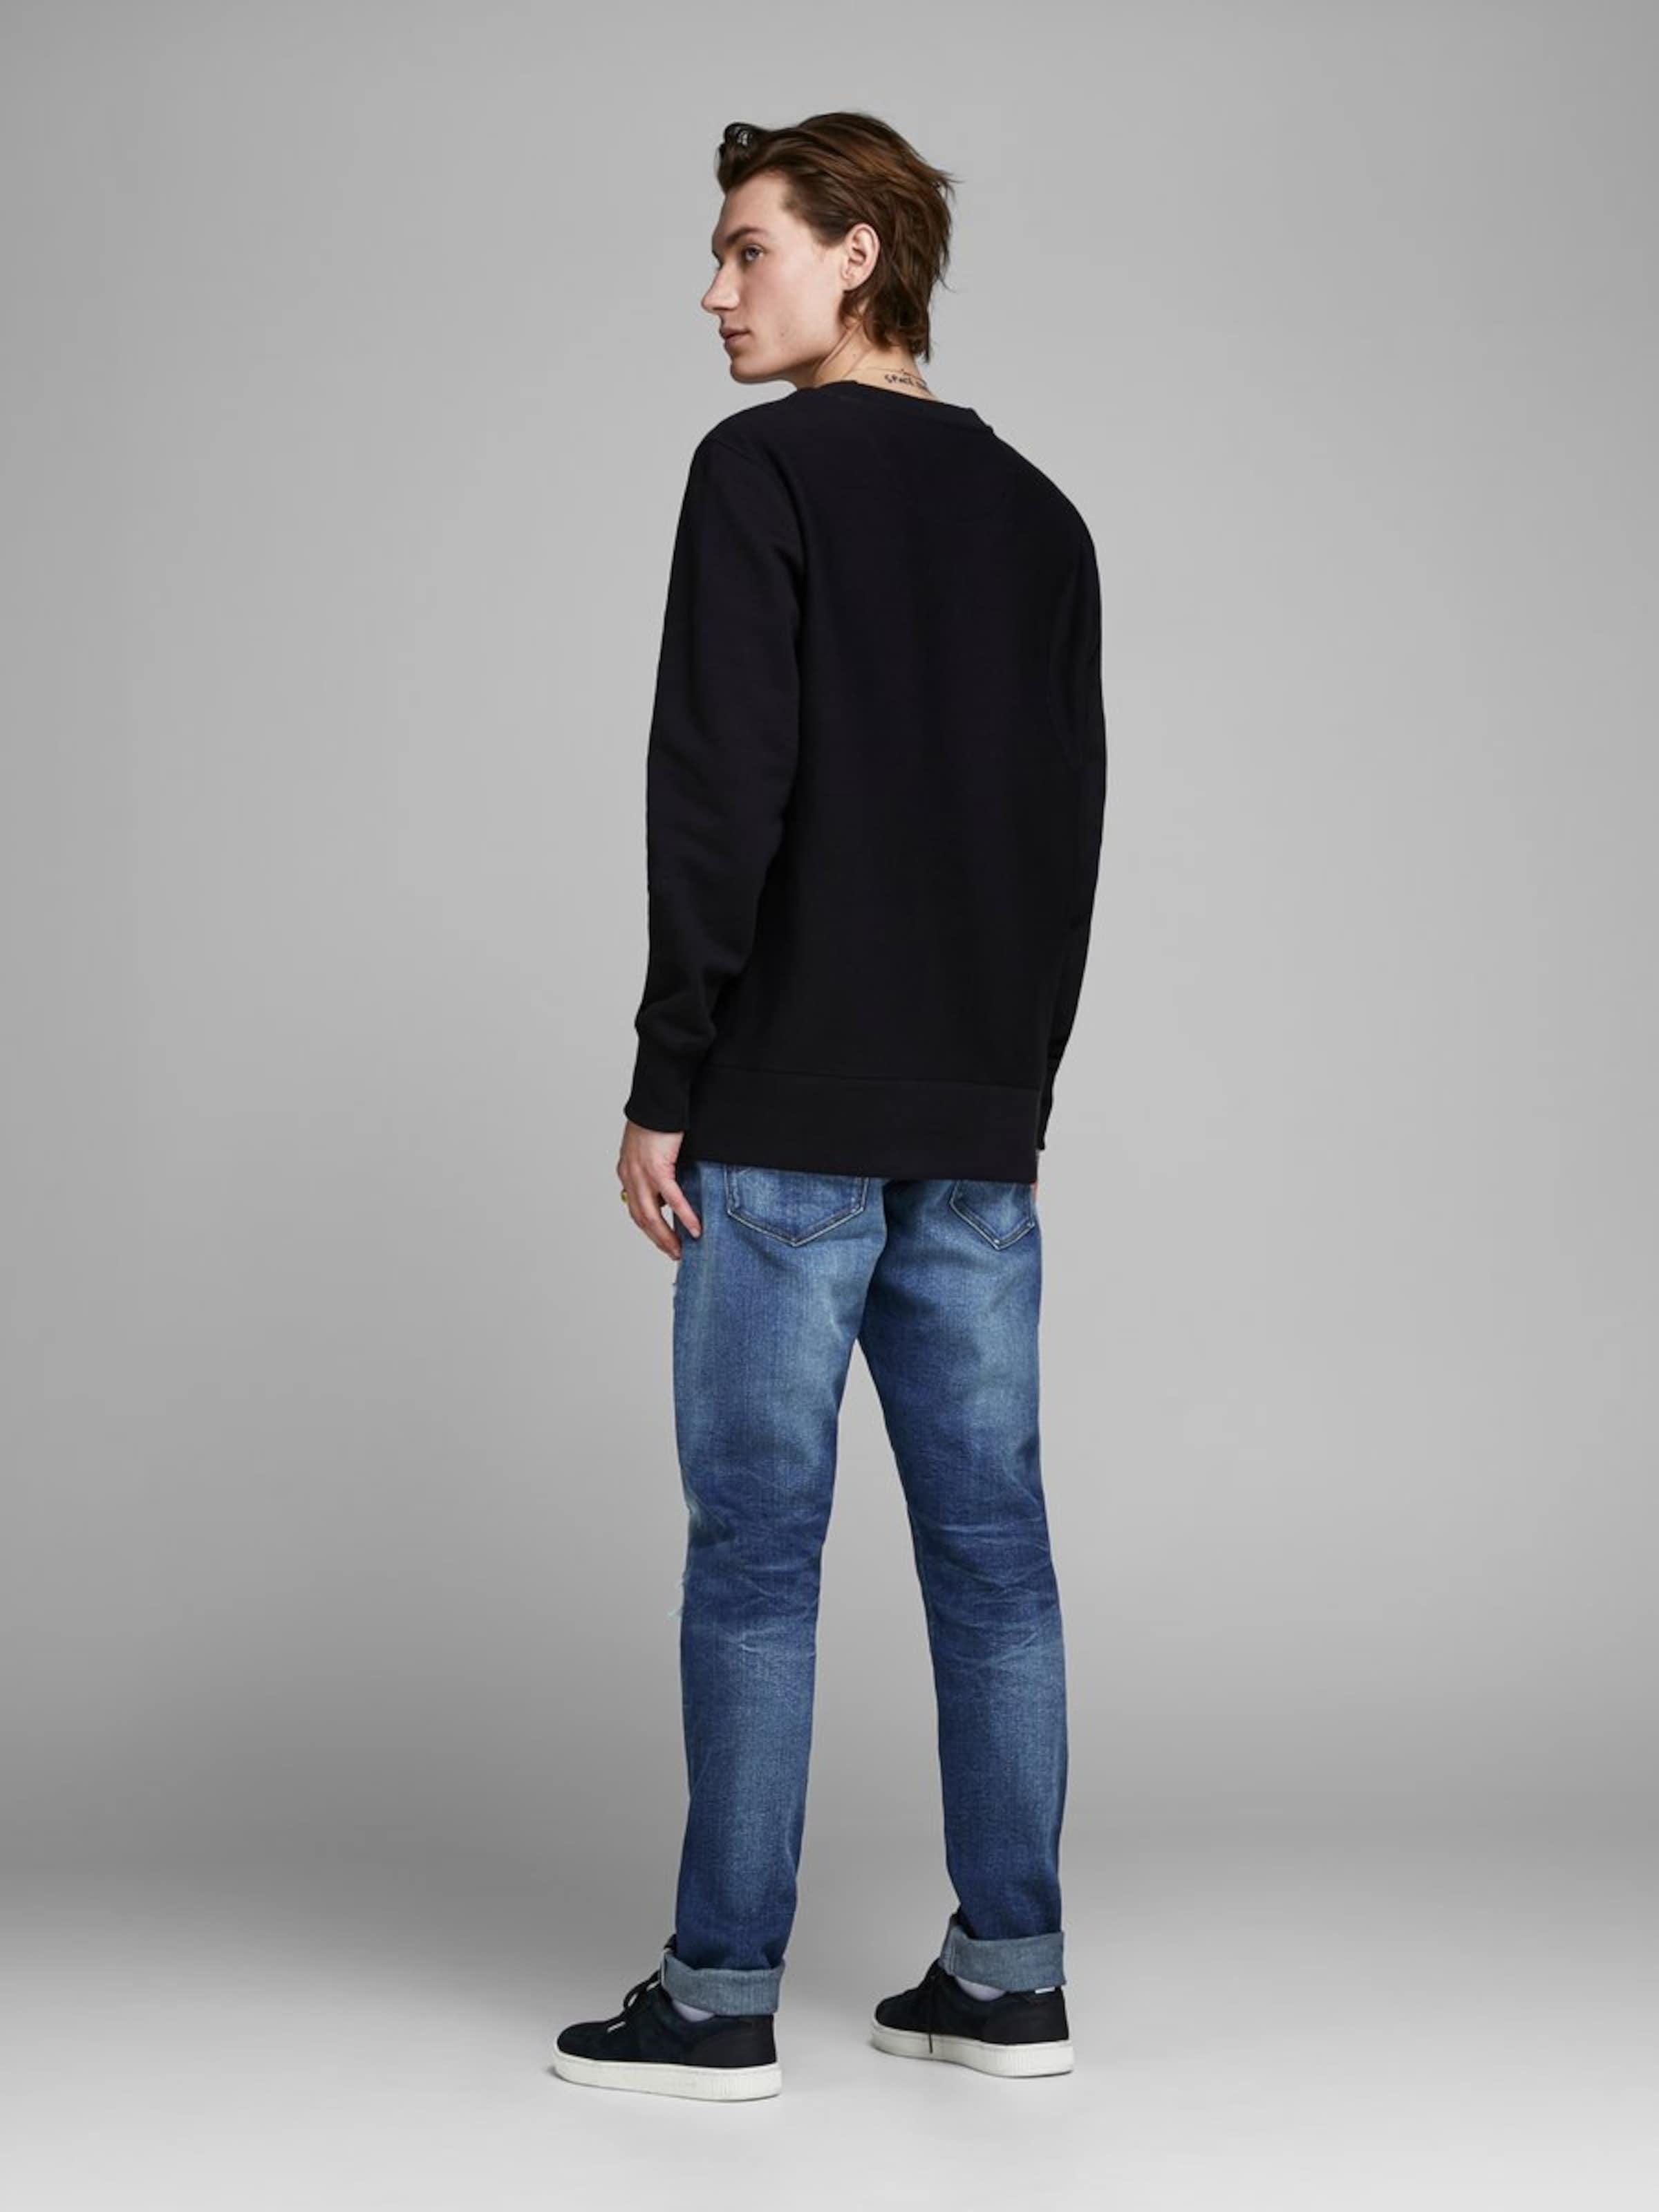 Royal Rdd In Jones R209 Blue Jeans Jackamp; Denim 'glenn Ltd' rQdxthCs